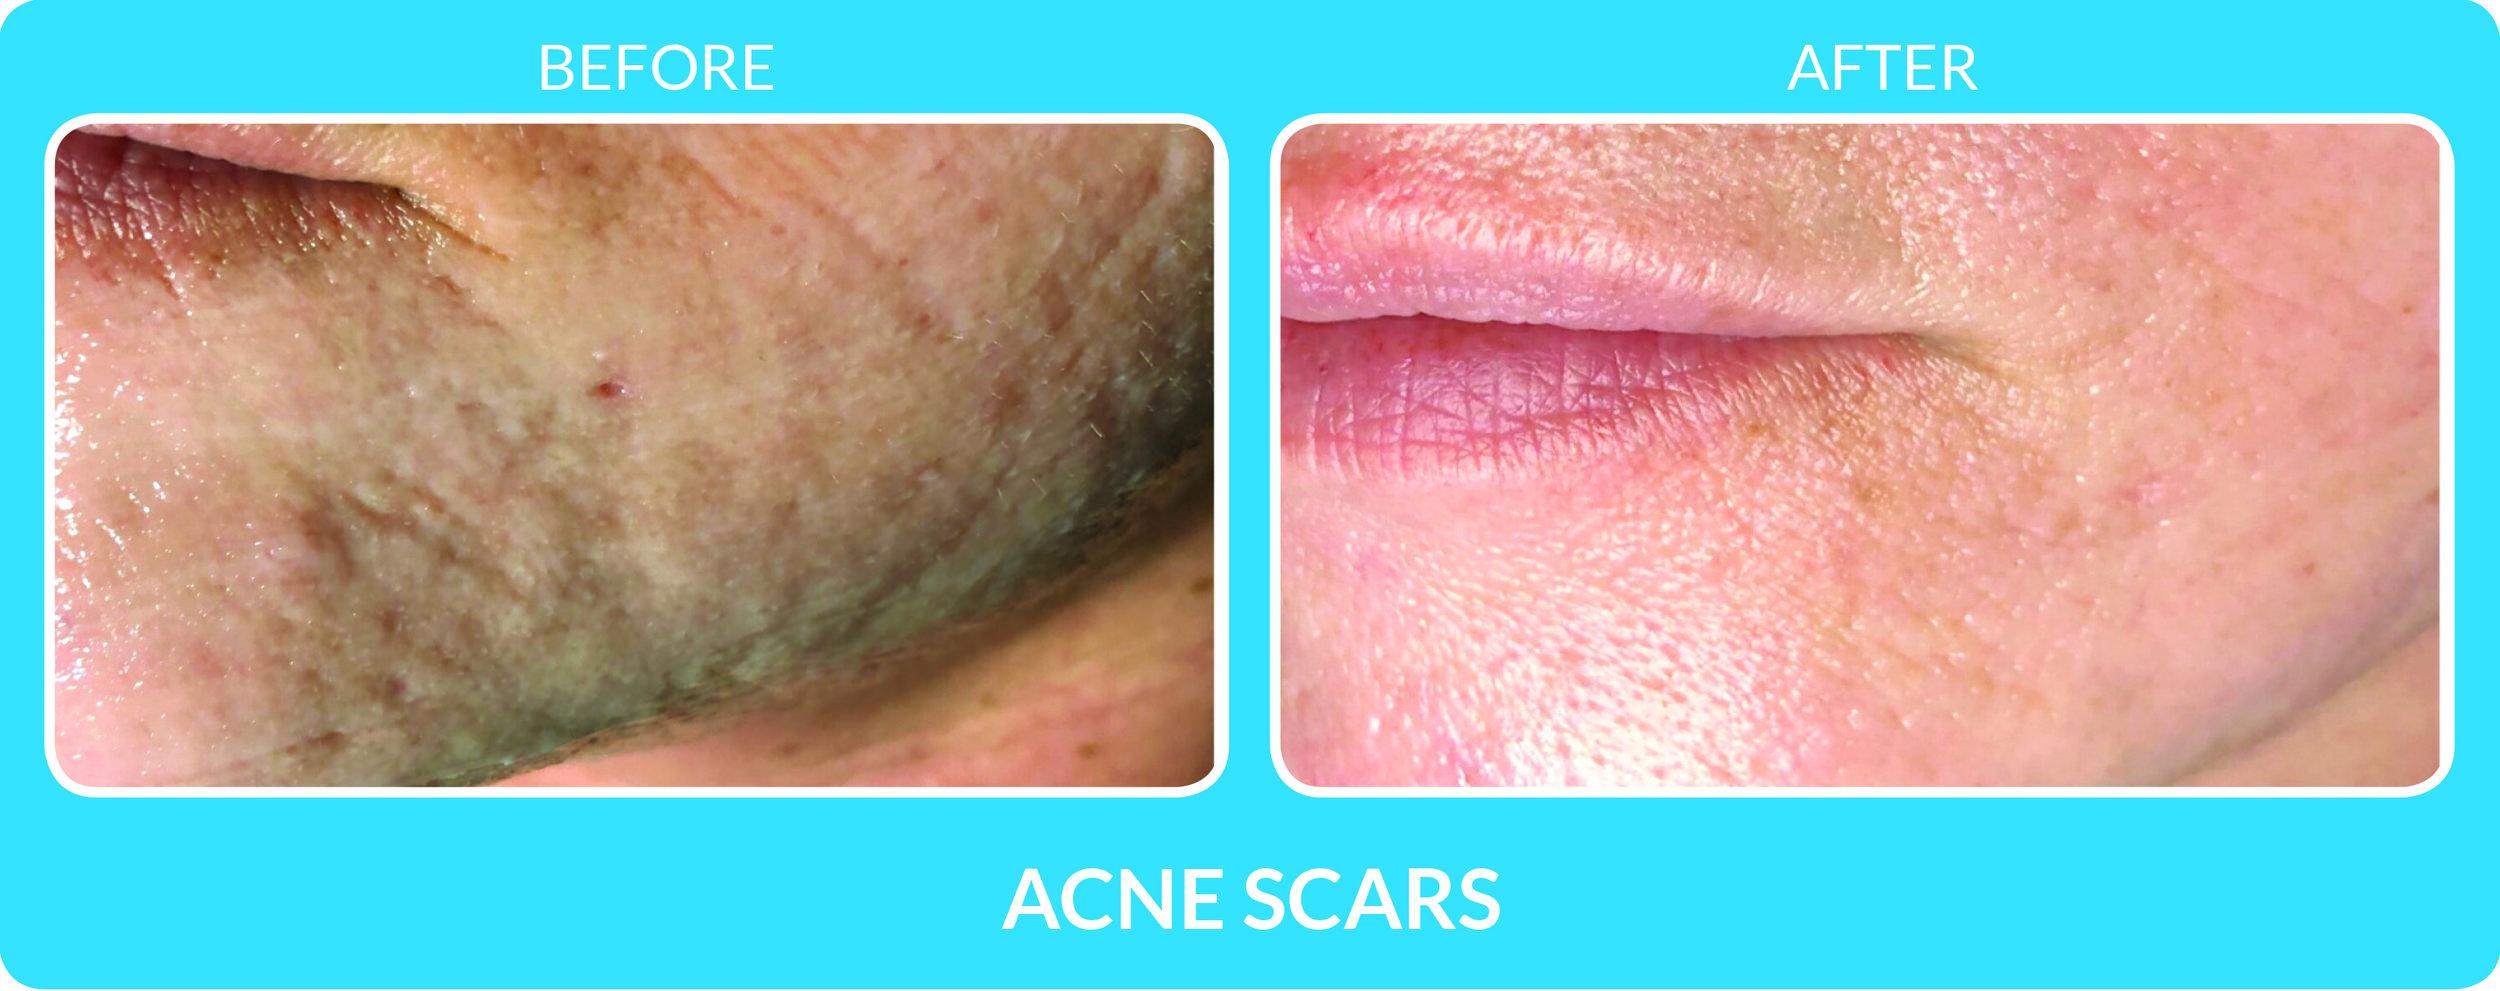 Acne Scars 4.jpg